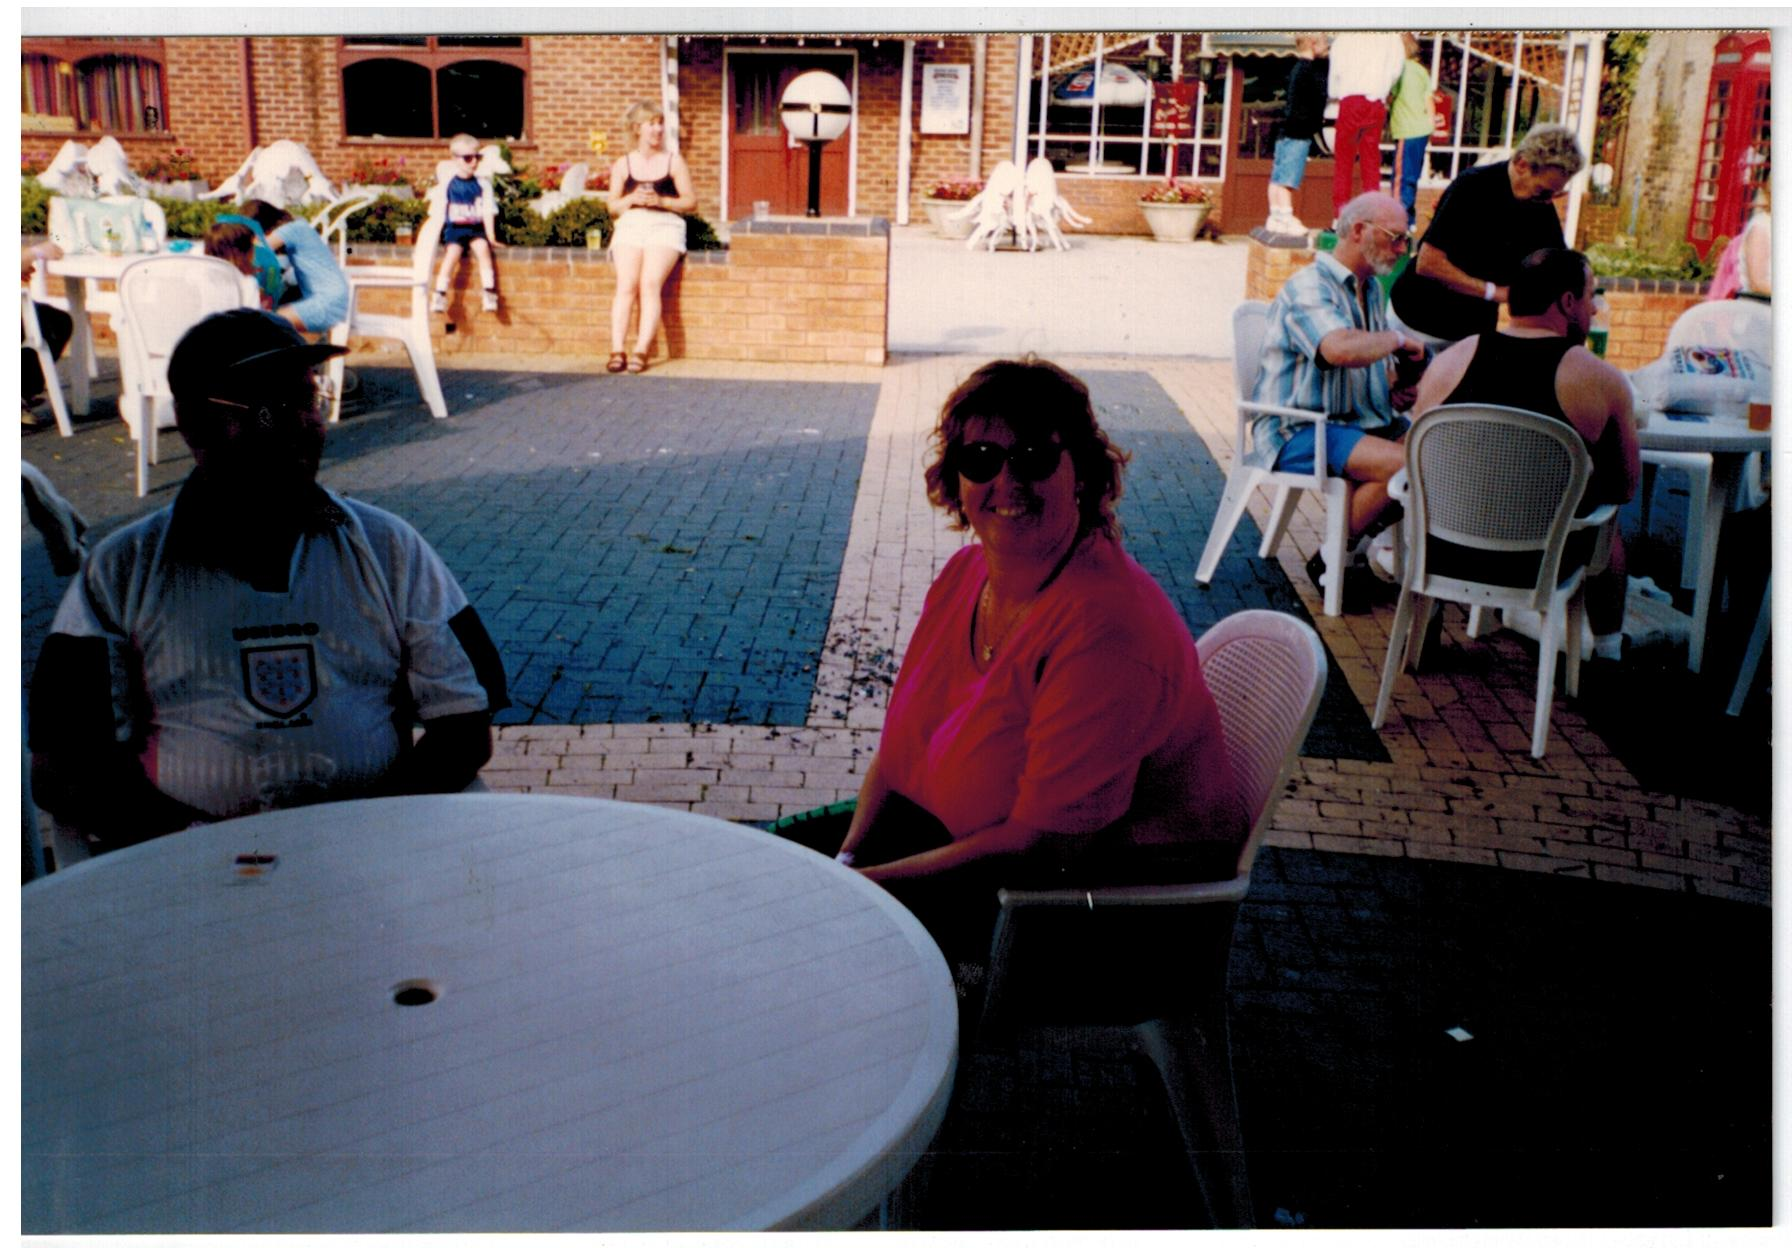 N077_Drayton-Manor_[1998]